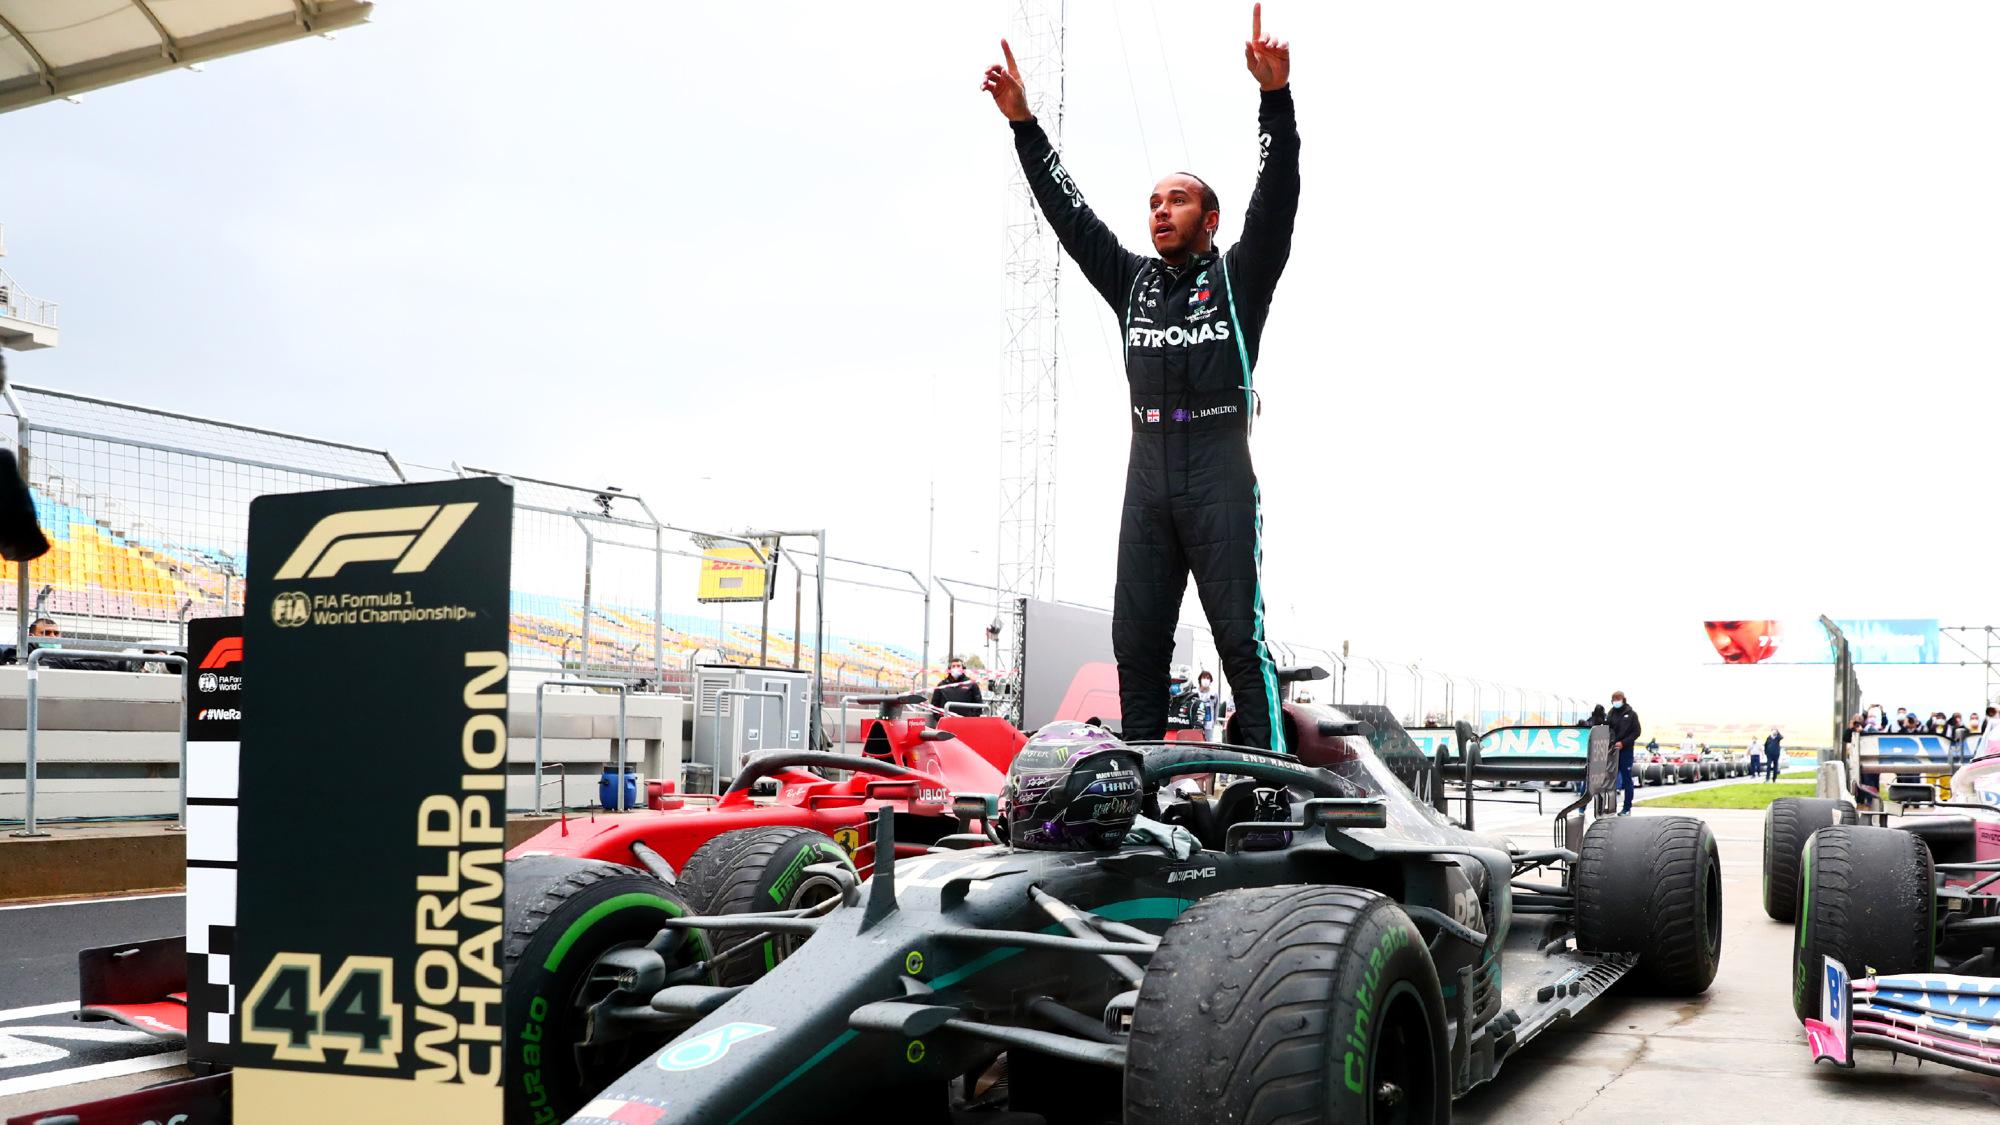 Lewis Hamilton, 2020 Turkish GP